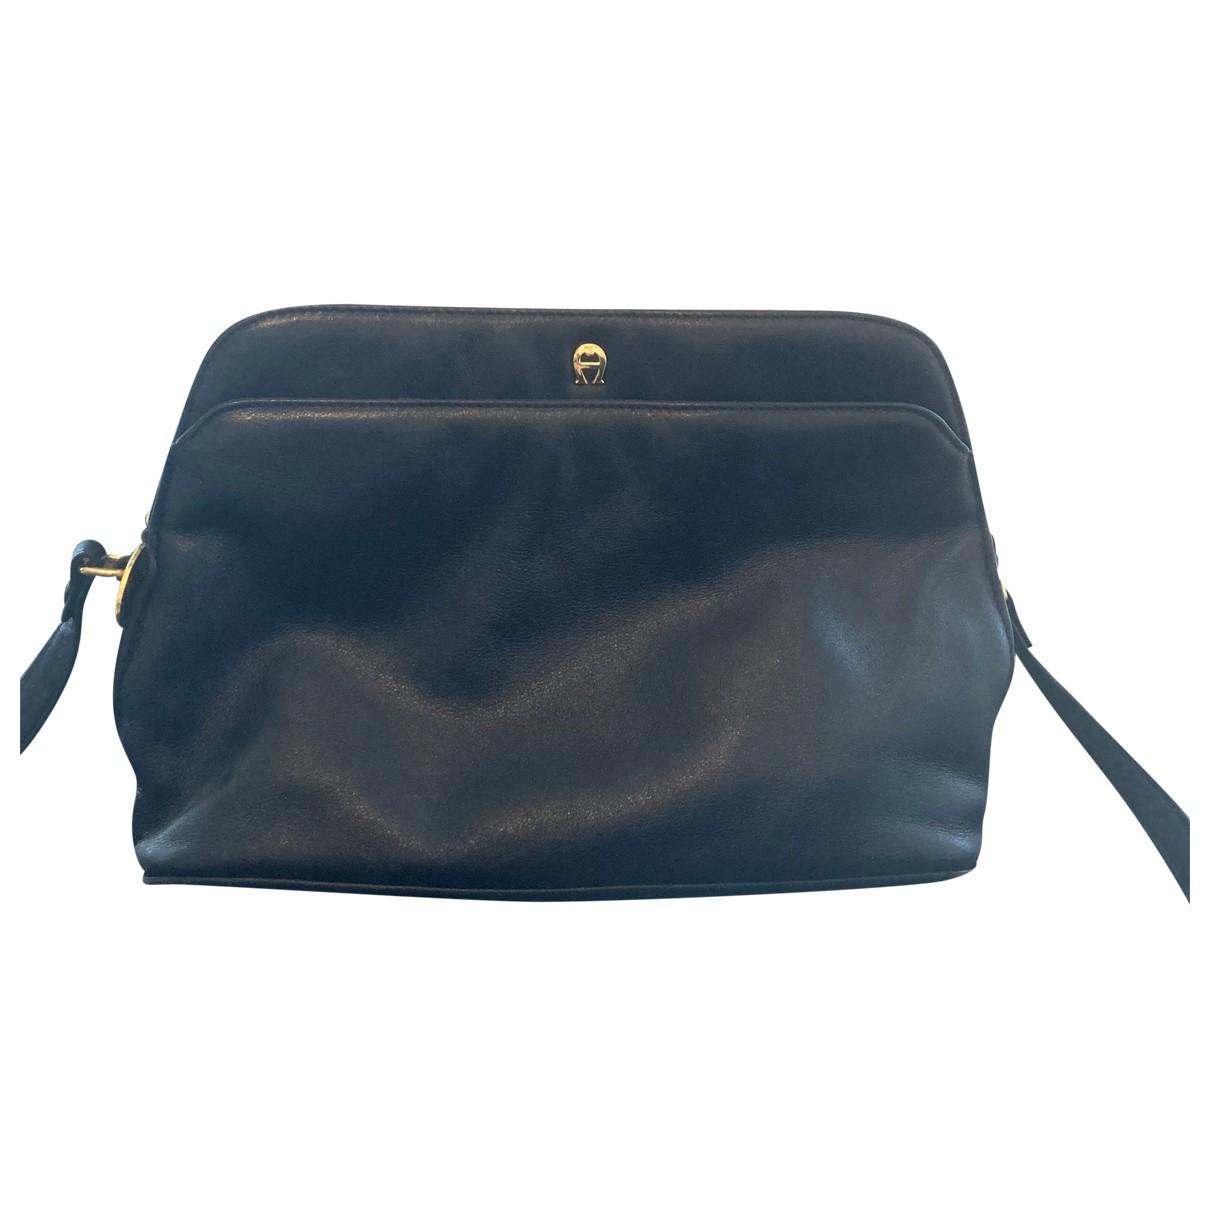 Aigner \N Handtasche in  Blau Leder